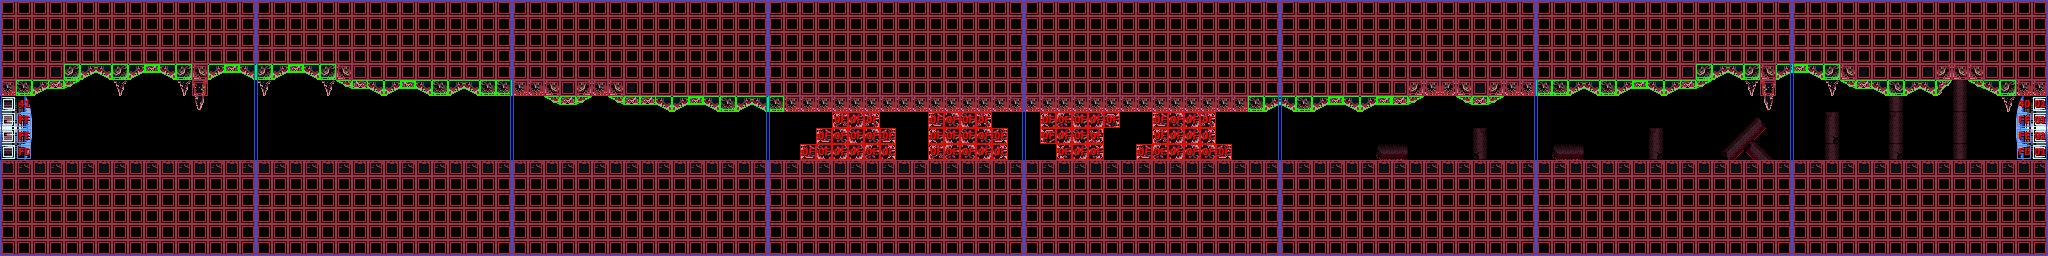 Long horizontal path